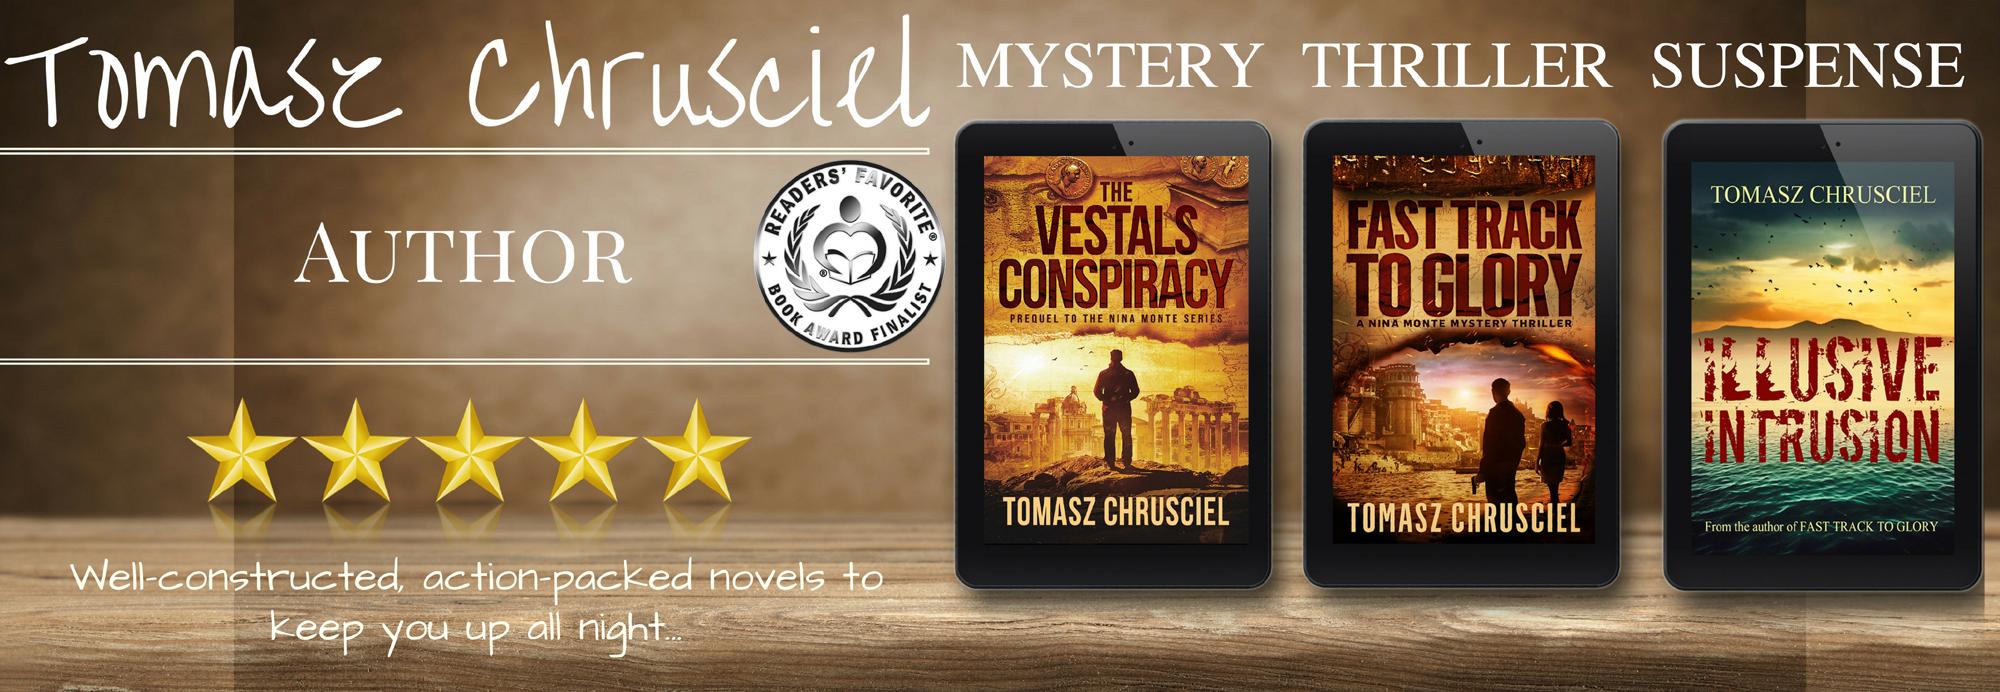 Tomasz Chrusciel Books